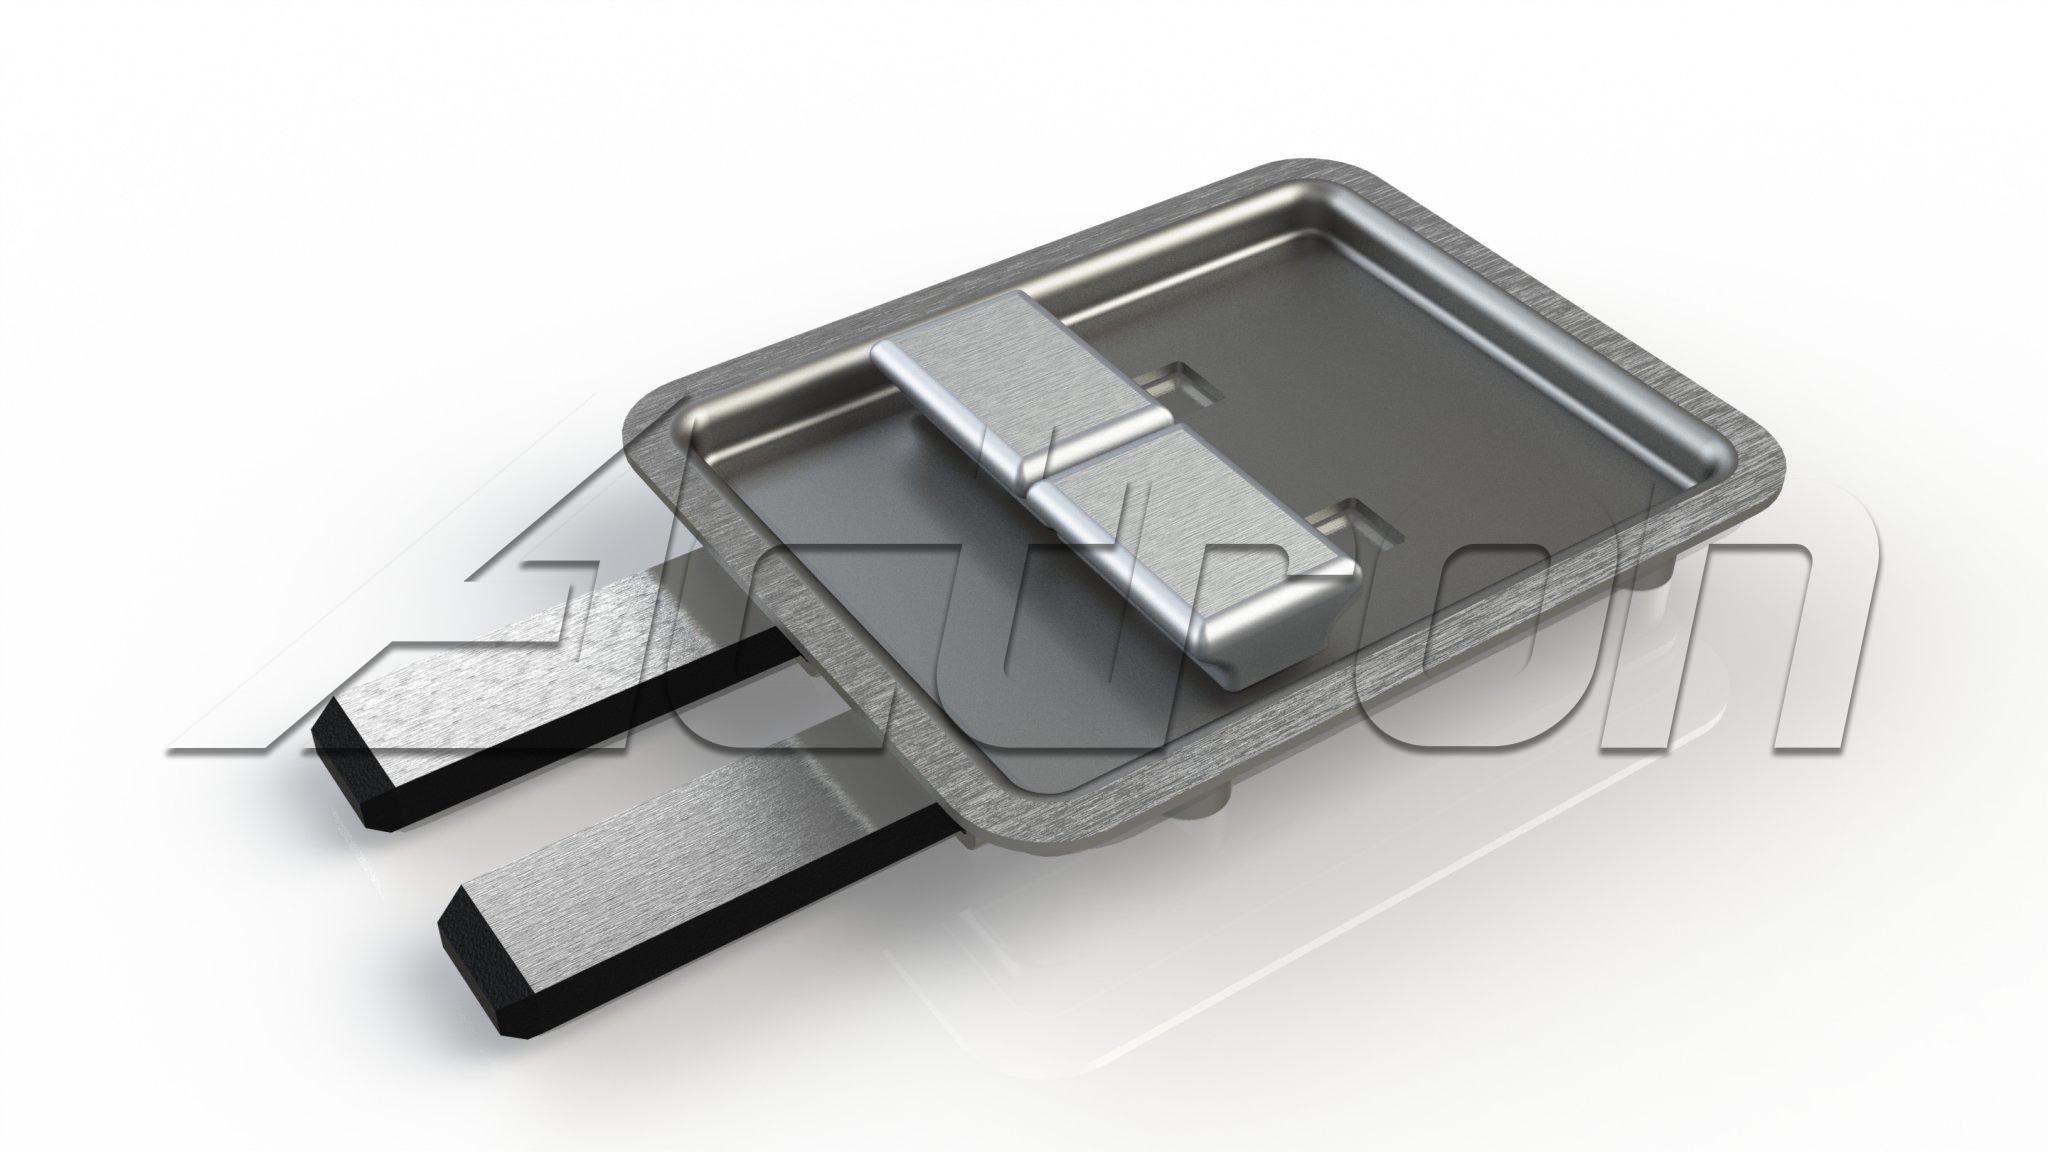 latch-assy-8211-sliding-4038-a27303.jpg